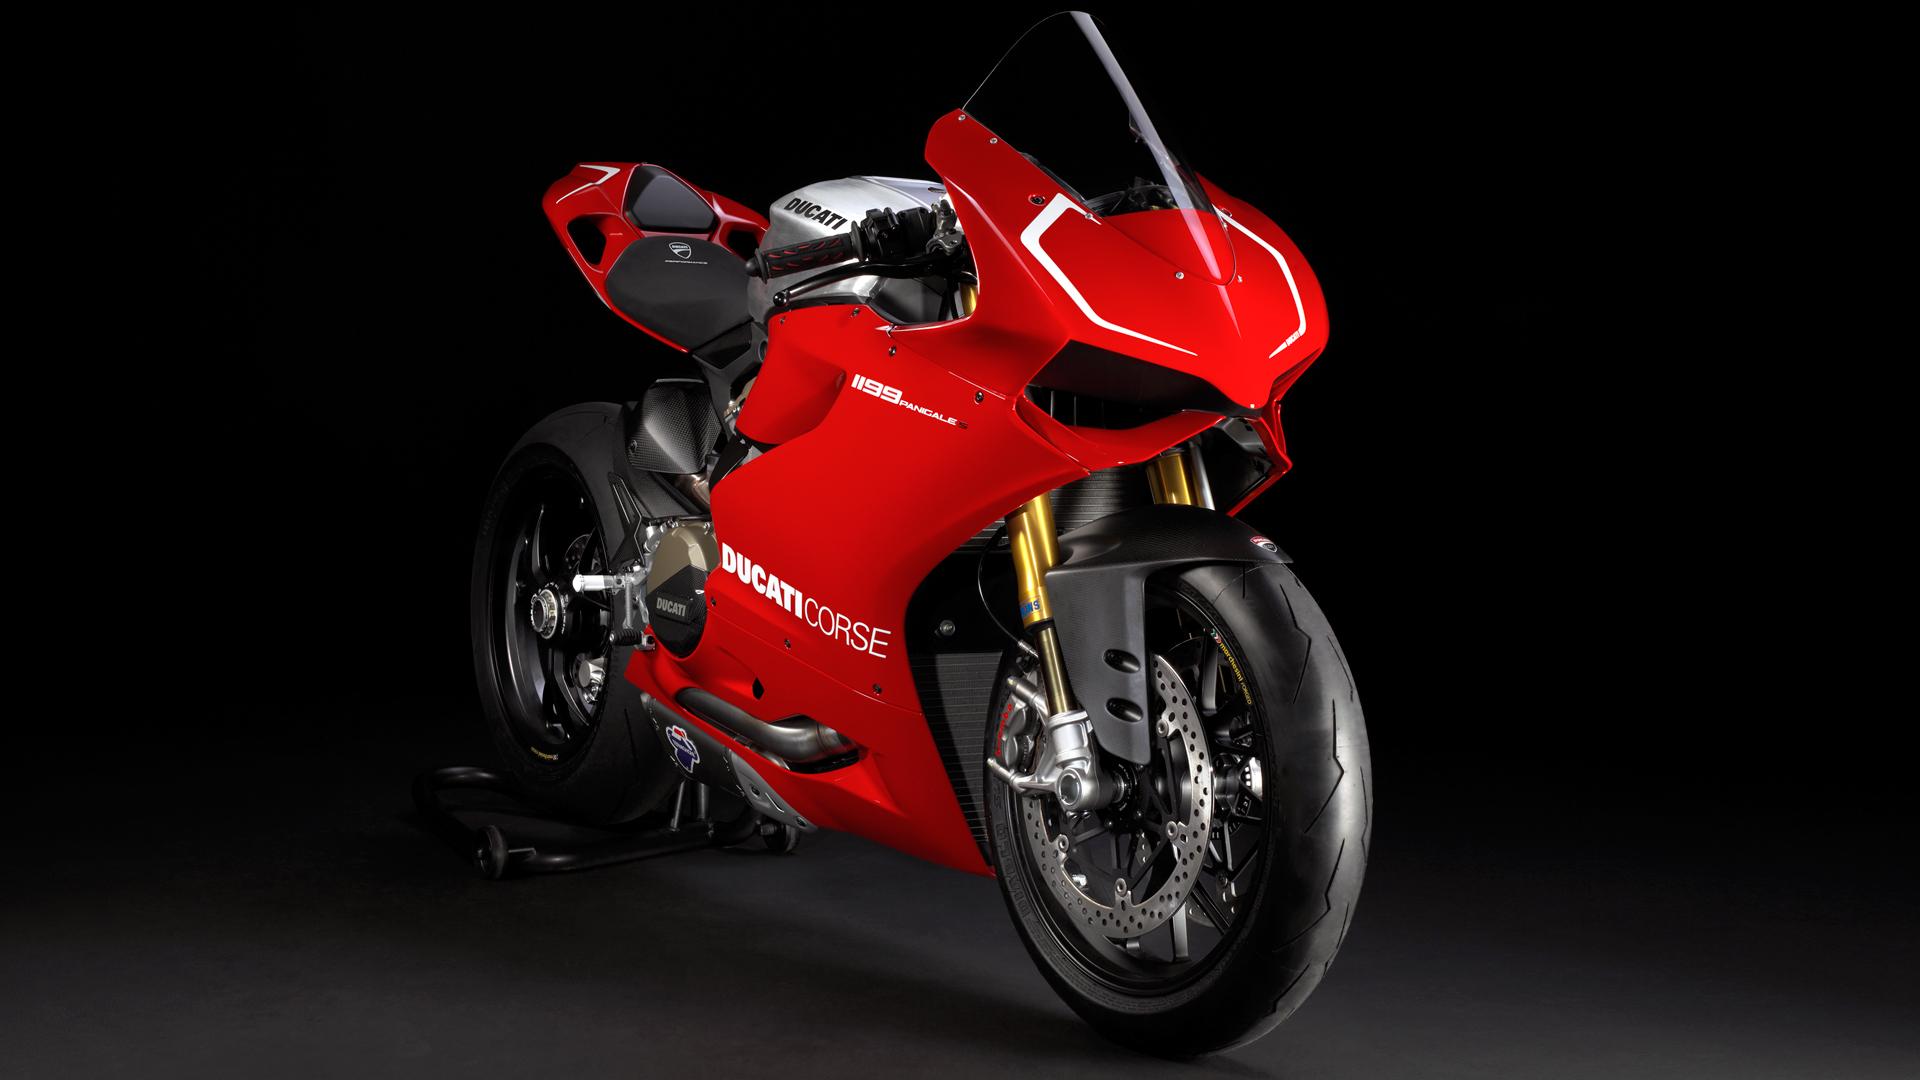 Ducati Hd Wallpaper Ducati Bike Wallpaper Hd 2116044